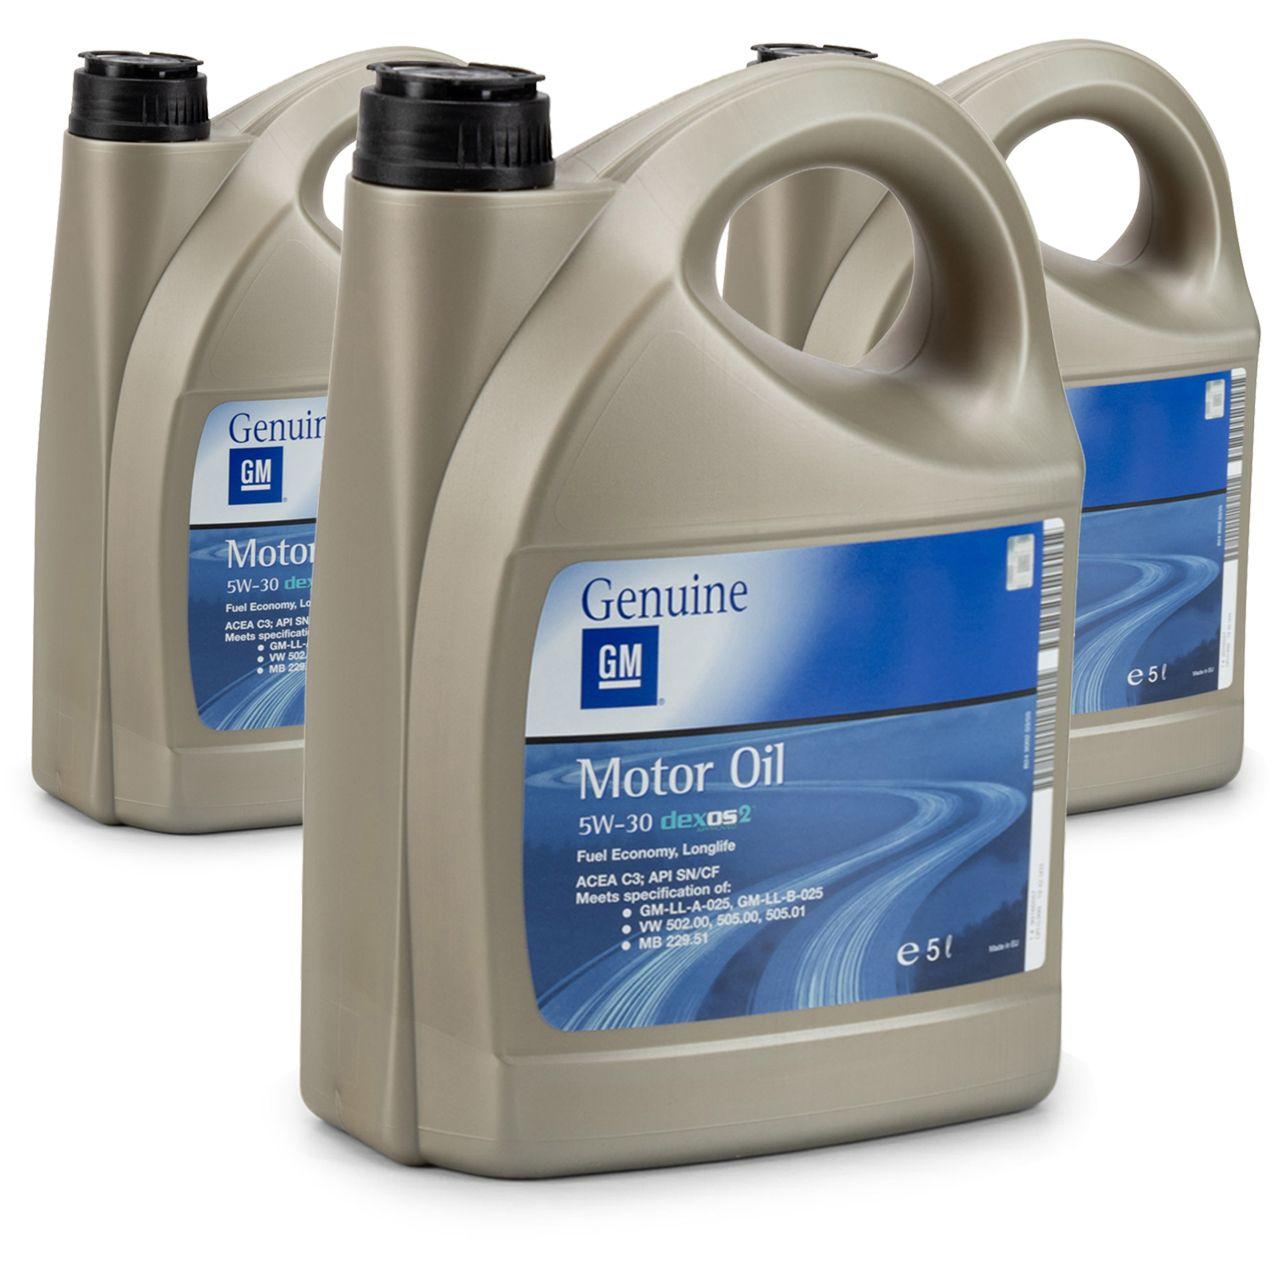 15 Liter = 3x5 ORIGINAL OPEL GM MOTORÖL 5W-30 dexos2 Longlife 5W30 ÖL - 1942003